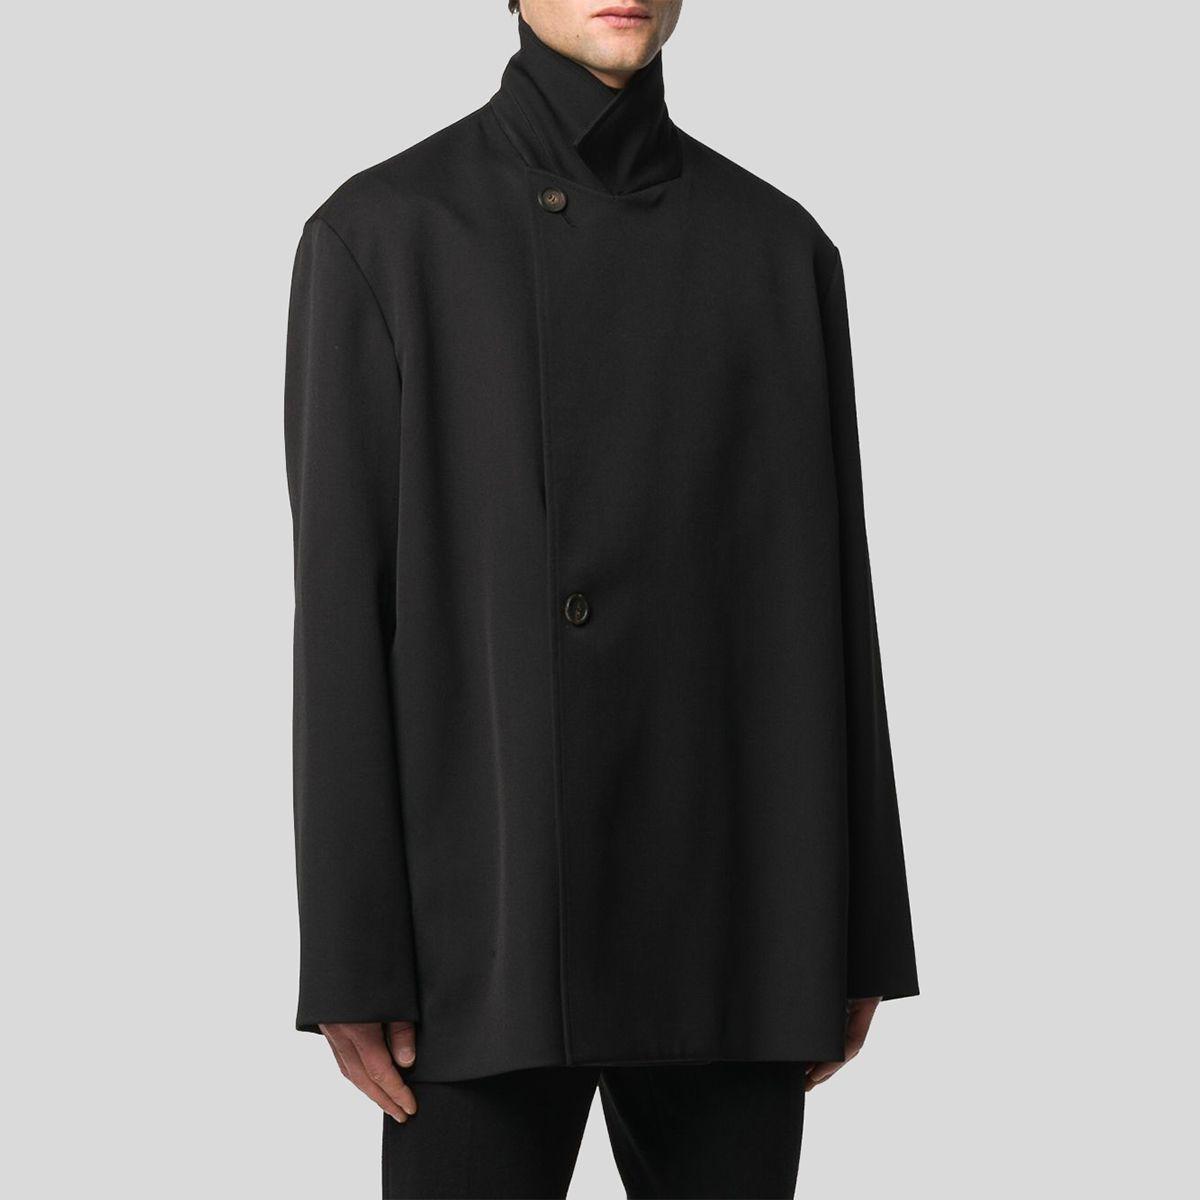 BALENCIAGA バレンシアガ ウールジャケット BB Wool Jacket